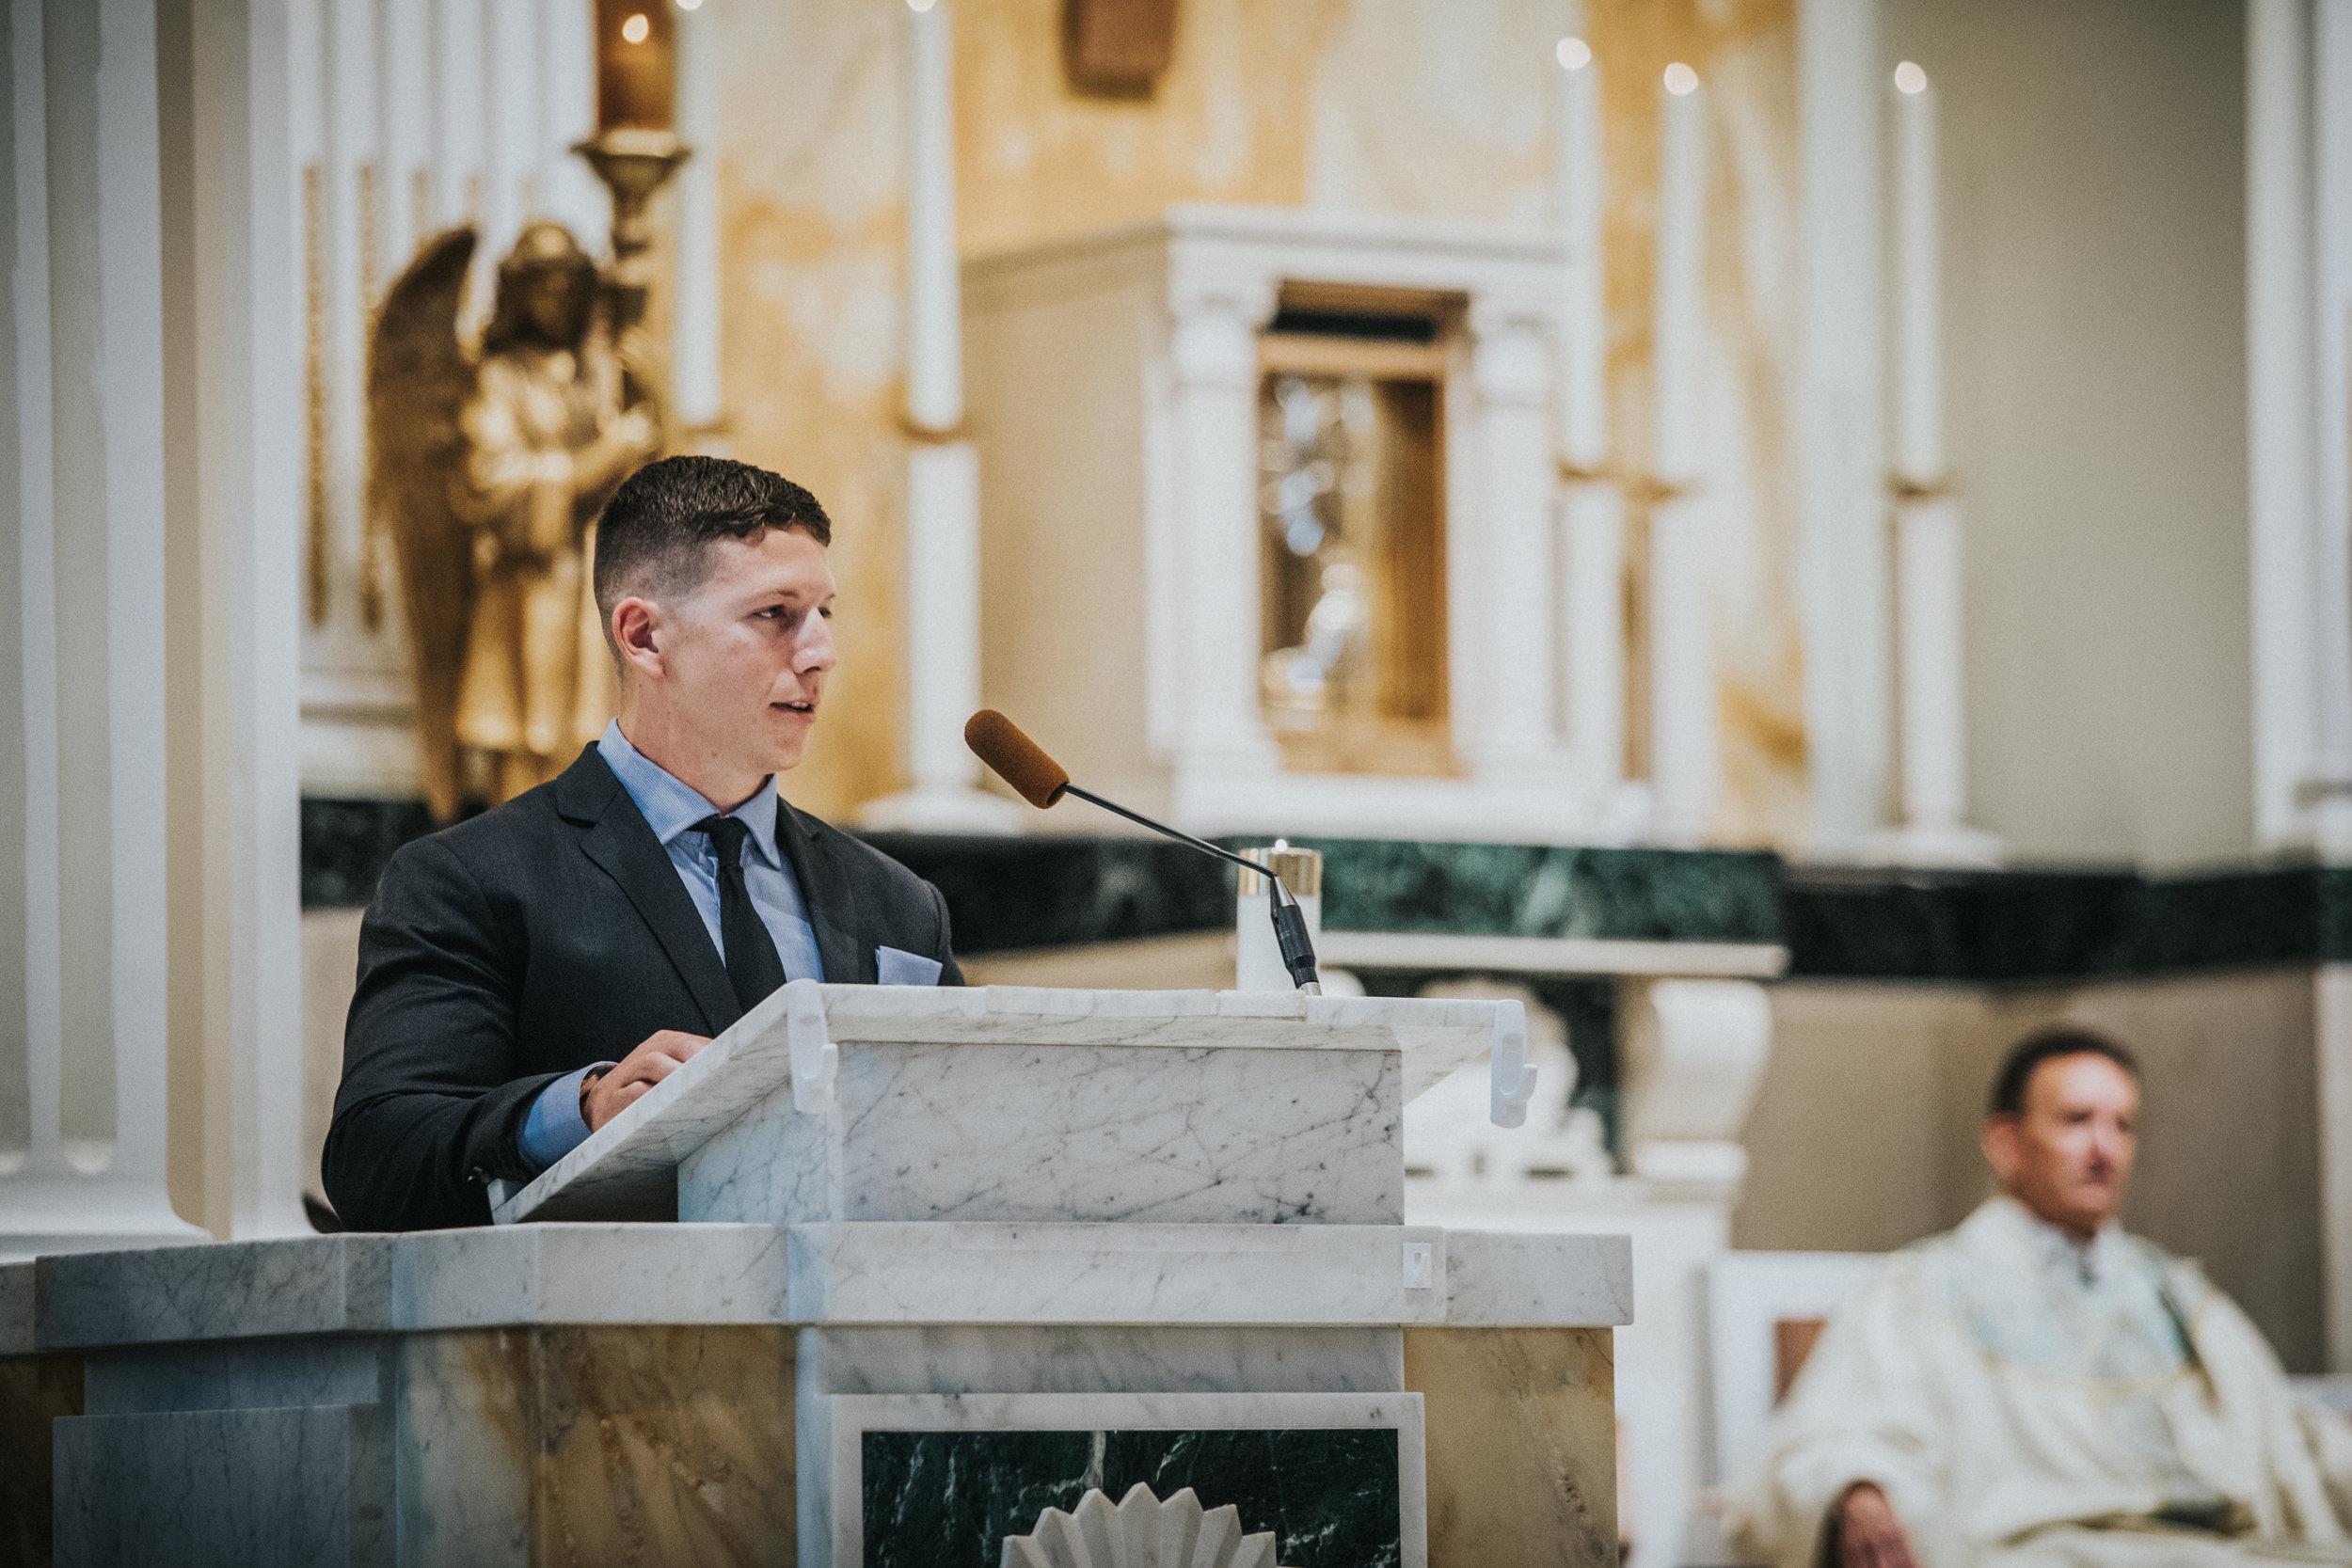 JennaLynnPhotography-NJWeddingPhotographer-Philadelphia-Wedding-ArtsBallroom-Ceremony-42.jpg